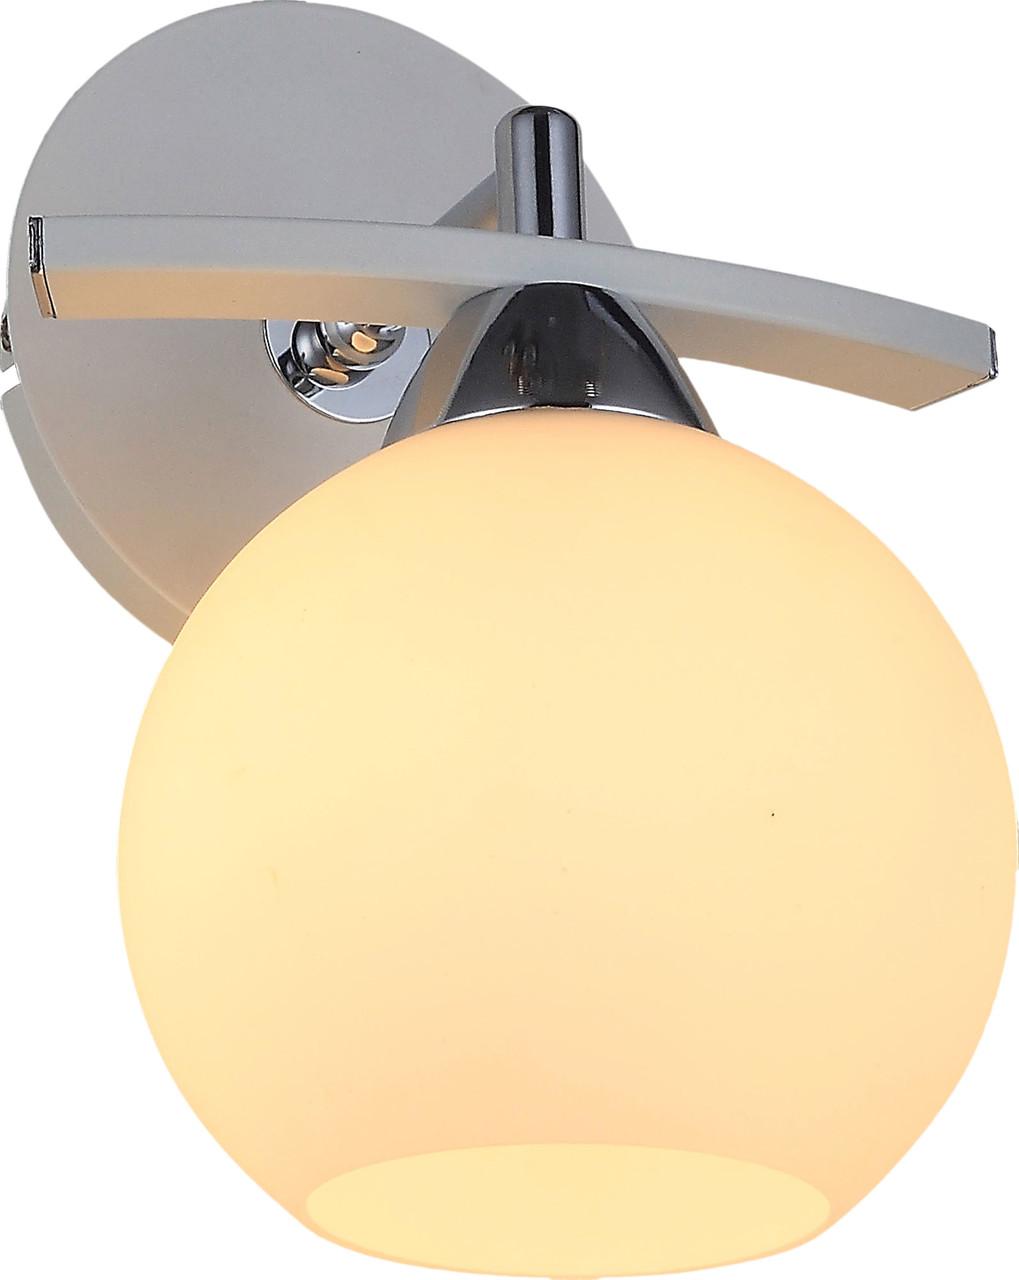 Бра Altalusse INL-9323W-01 White & Chrome